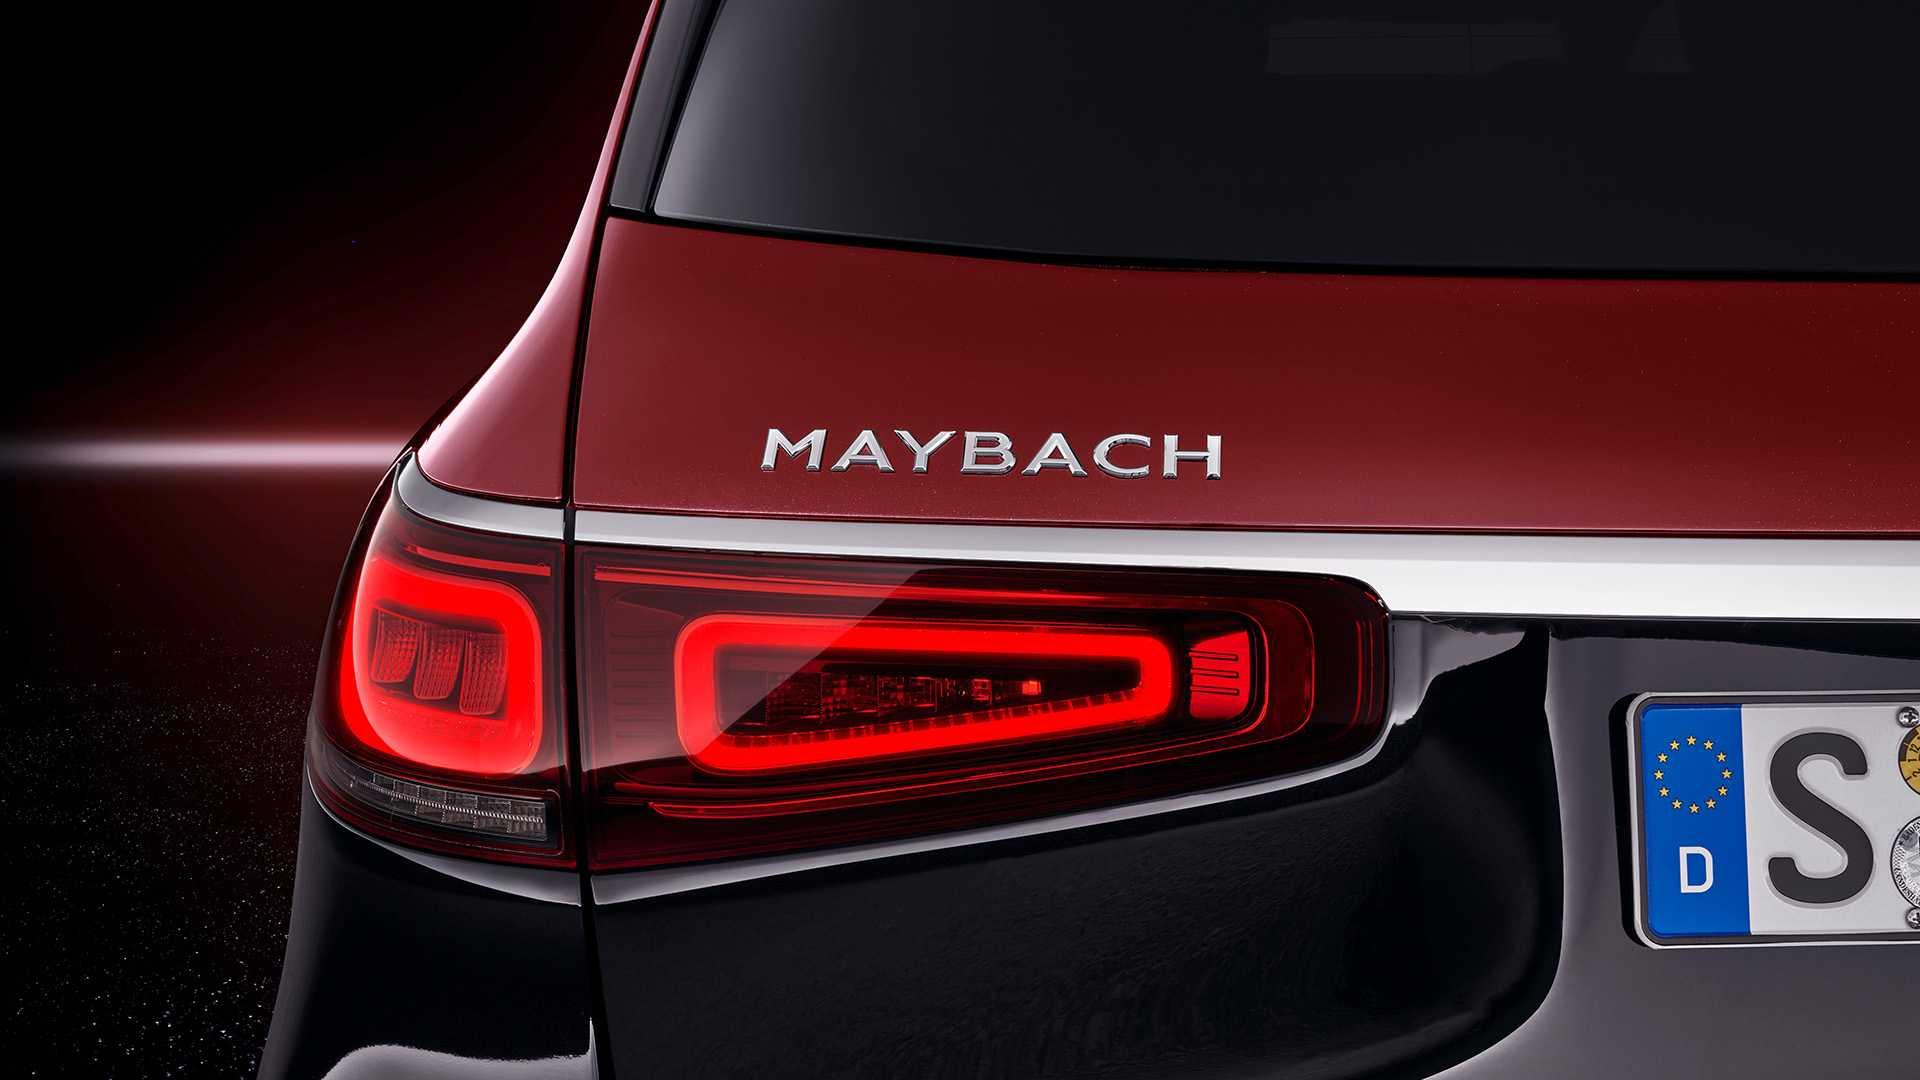 mercedes-maybach-gls-2020 (3)